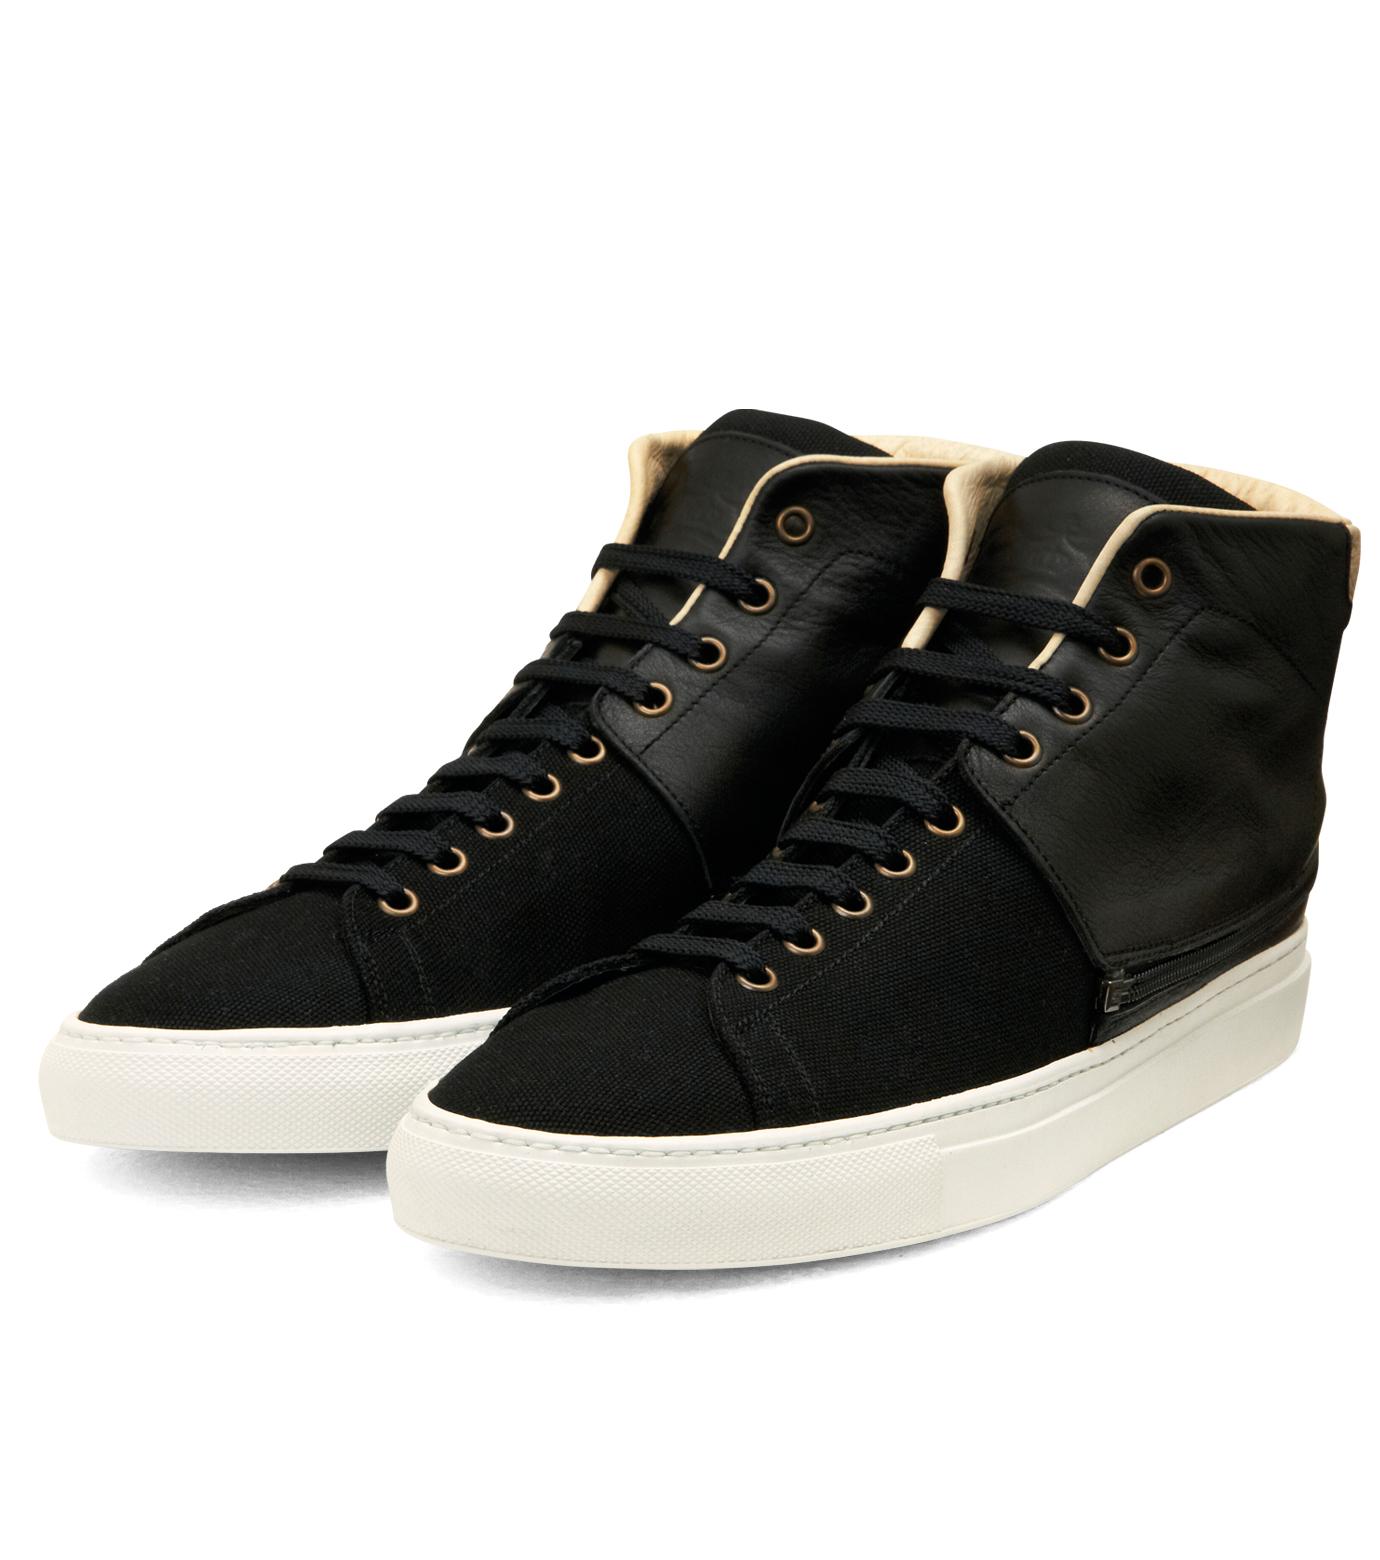 Trussardi(トラサルディ)のSeparate Sneaker-BLACK-1RS721-13 拡大詳細画像5